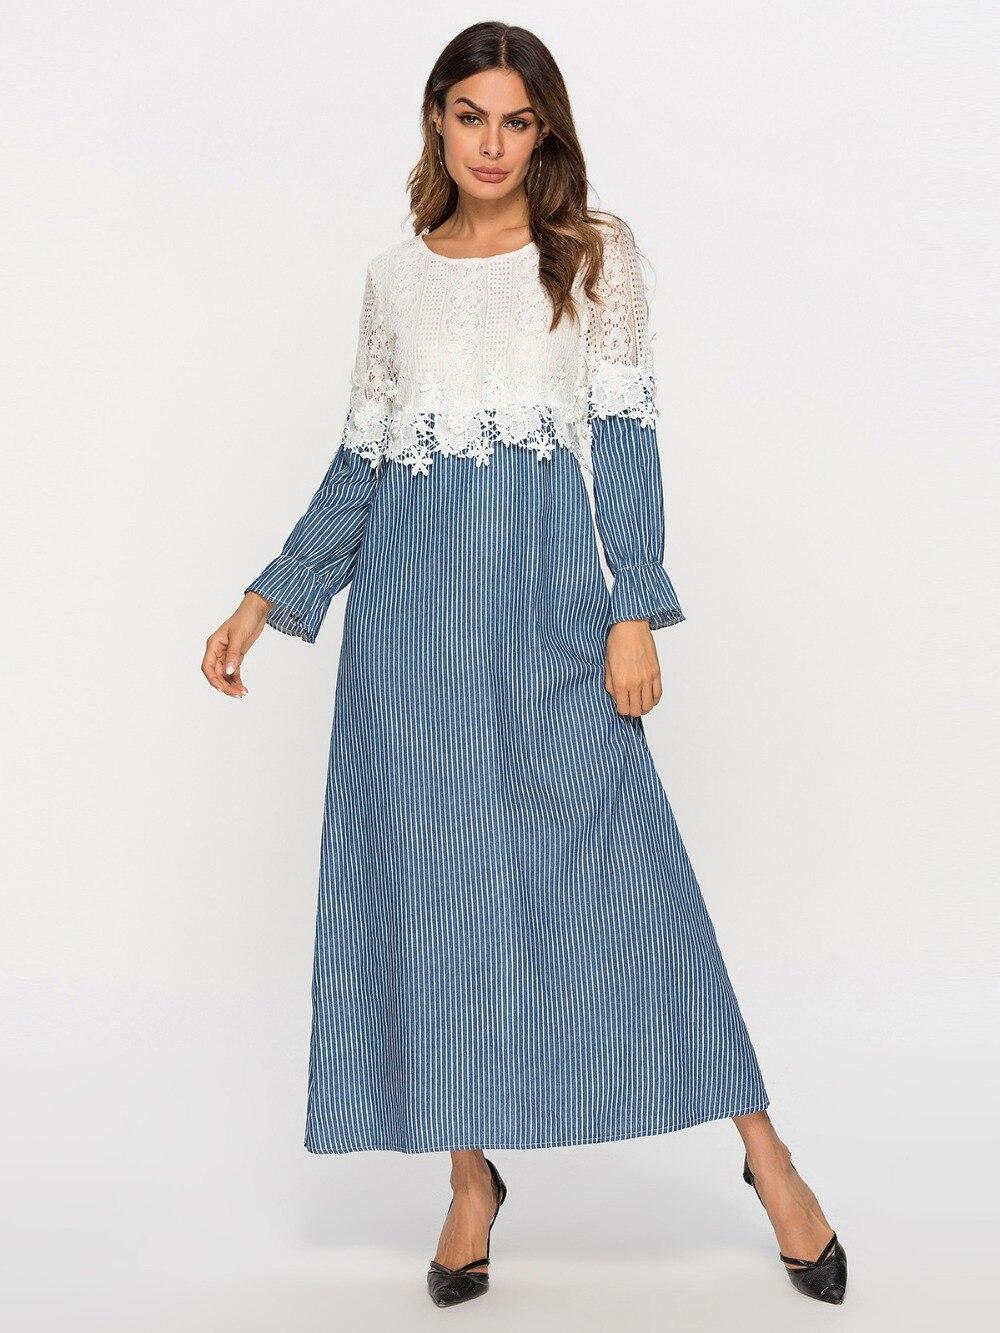 dc8b9bca6c Elegant Chic Embroidery Velvet Muslim Swing Maxi Dress Long Robe ...